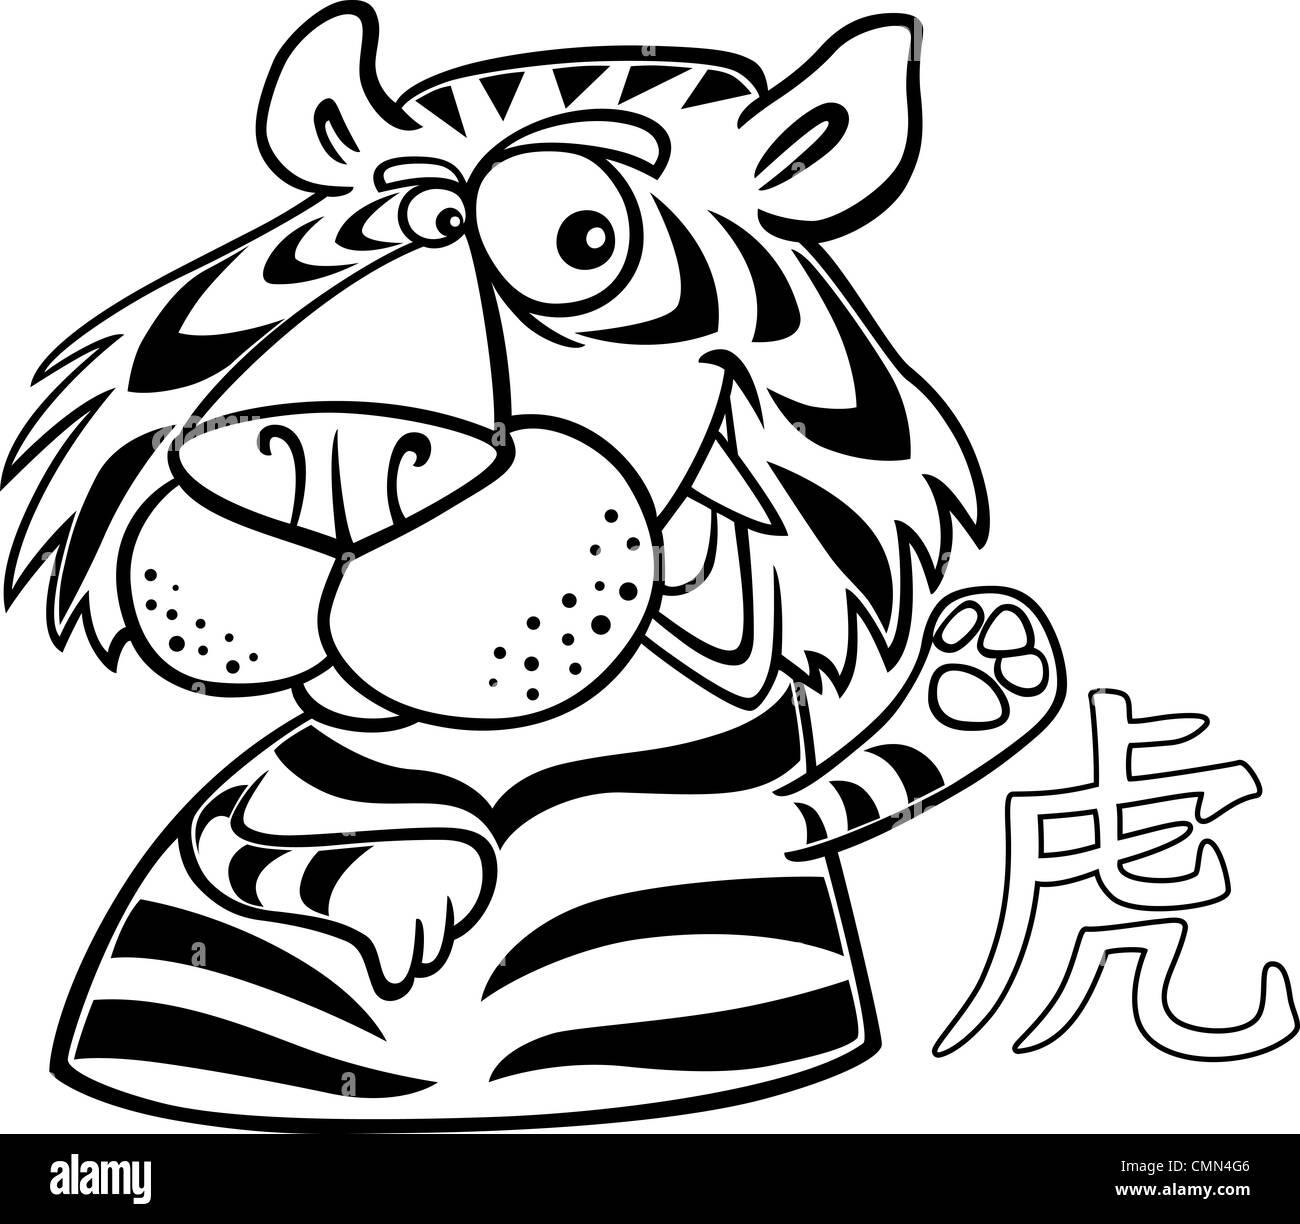 black and white cartoon illustration of tiger chinese horoscope